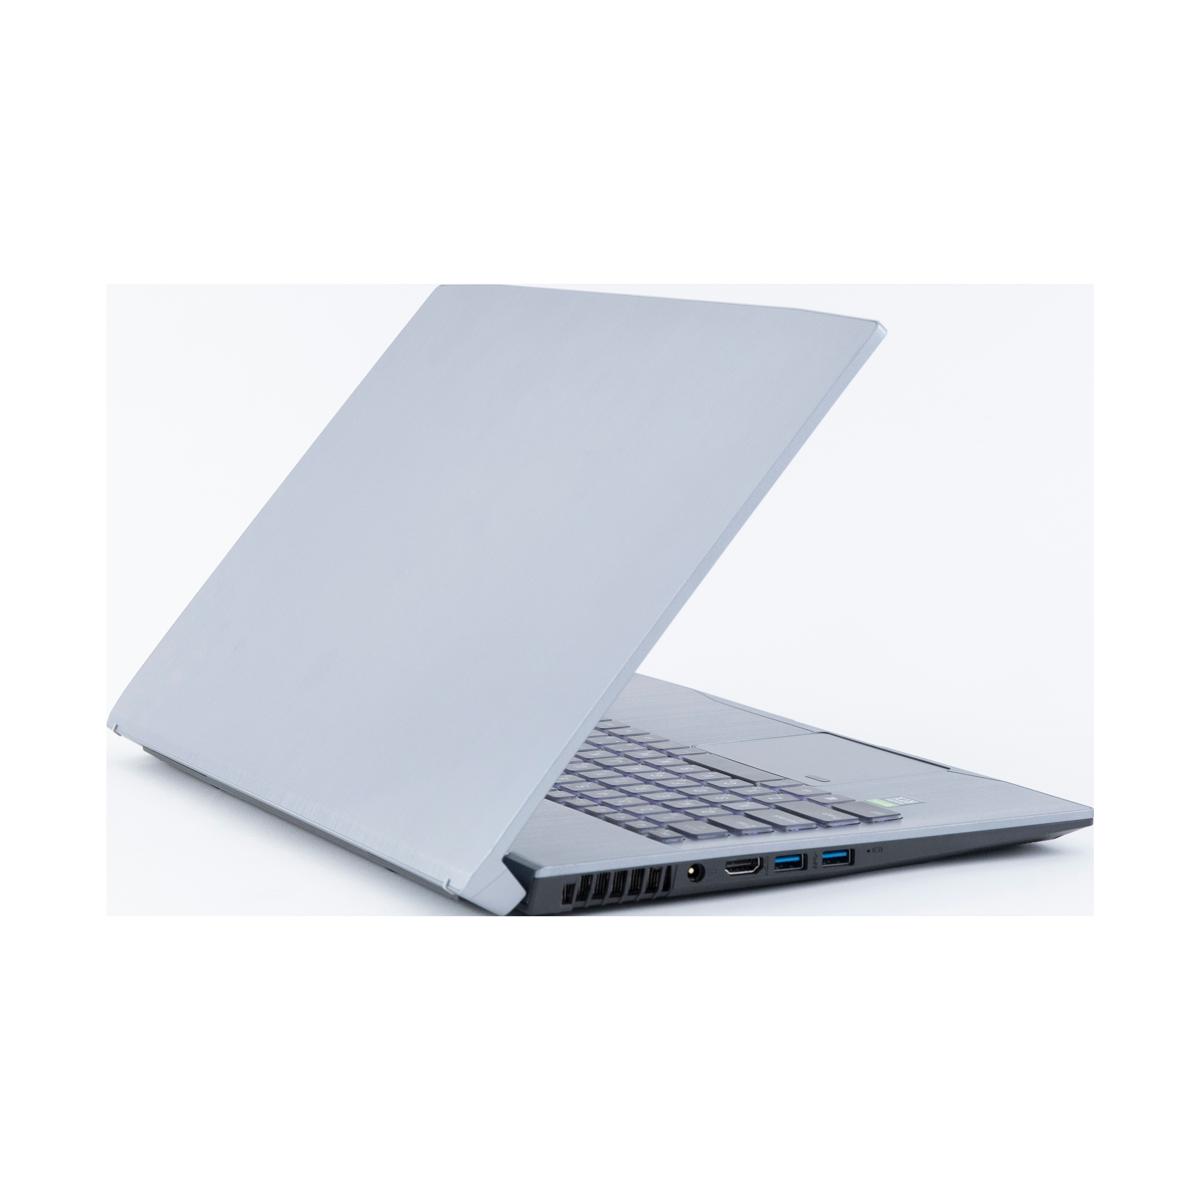 ELSA VELUGA 3000 G2-17(Win10Pro版)17.3インチ / Core i9 11980HK /QuadroRTX 3000 / メモリ 32GB / SSD 1TB /Win10Pro / ノートパソコン ELSA エルザ モバイルワークステーション ELVF33K9321TBHD3WR 【代引・日時指定・キャンセル不可・北海道沖縄離島配送不可】